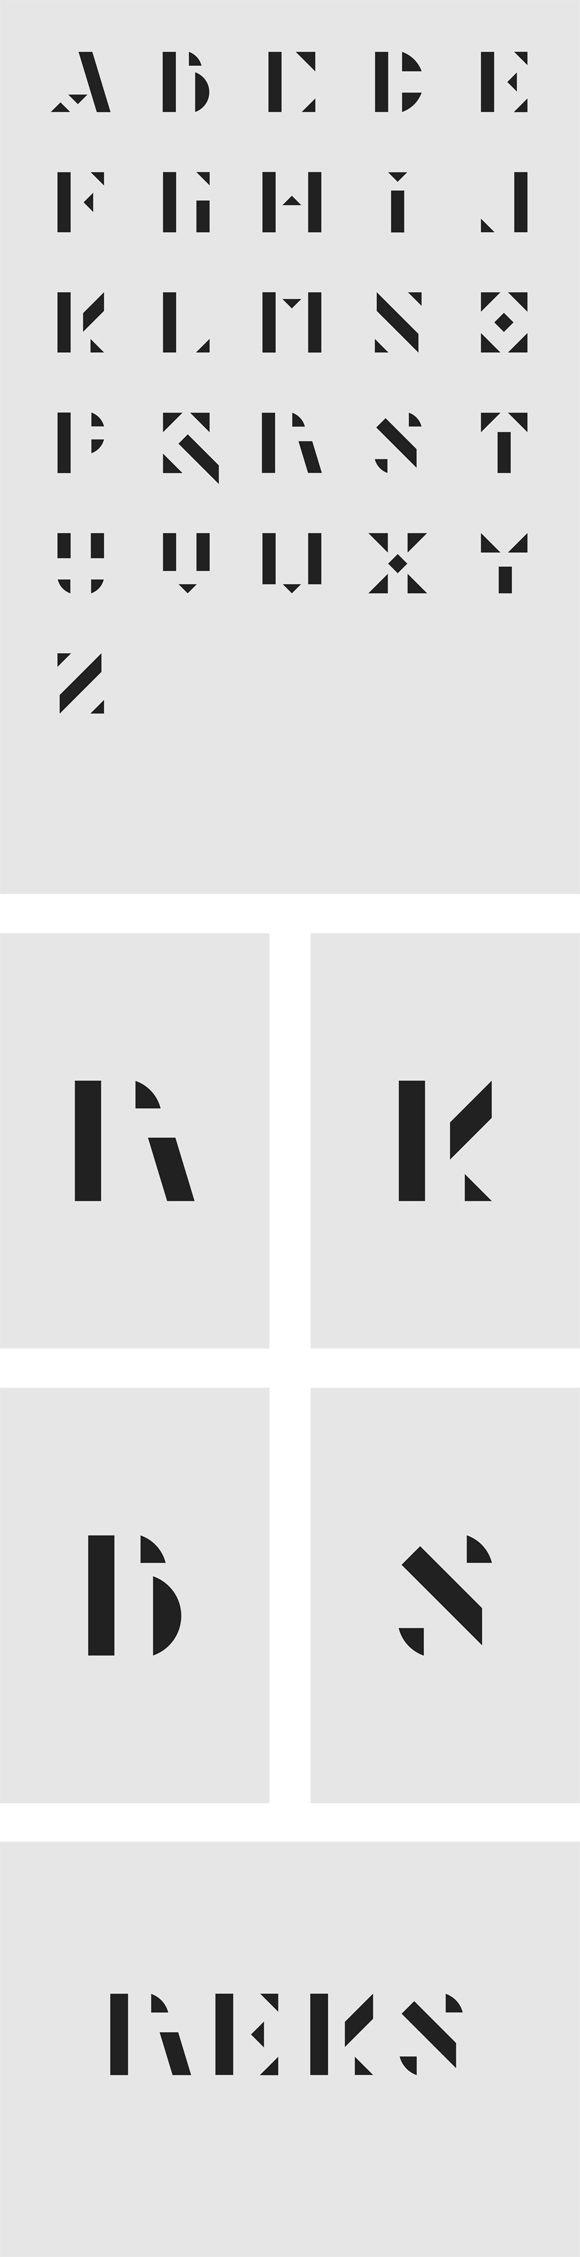 Typographie Forme Gomtrique  Typographie    Fonts